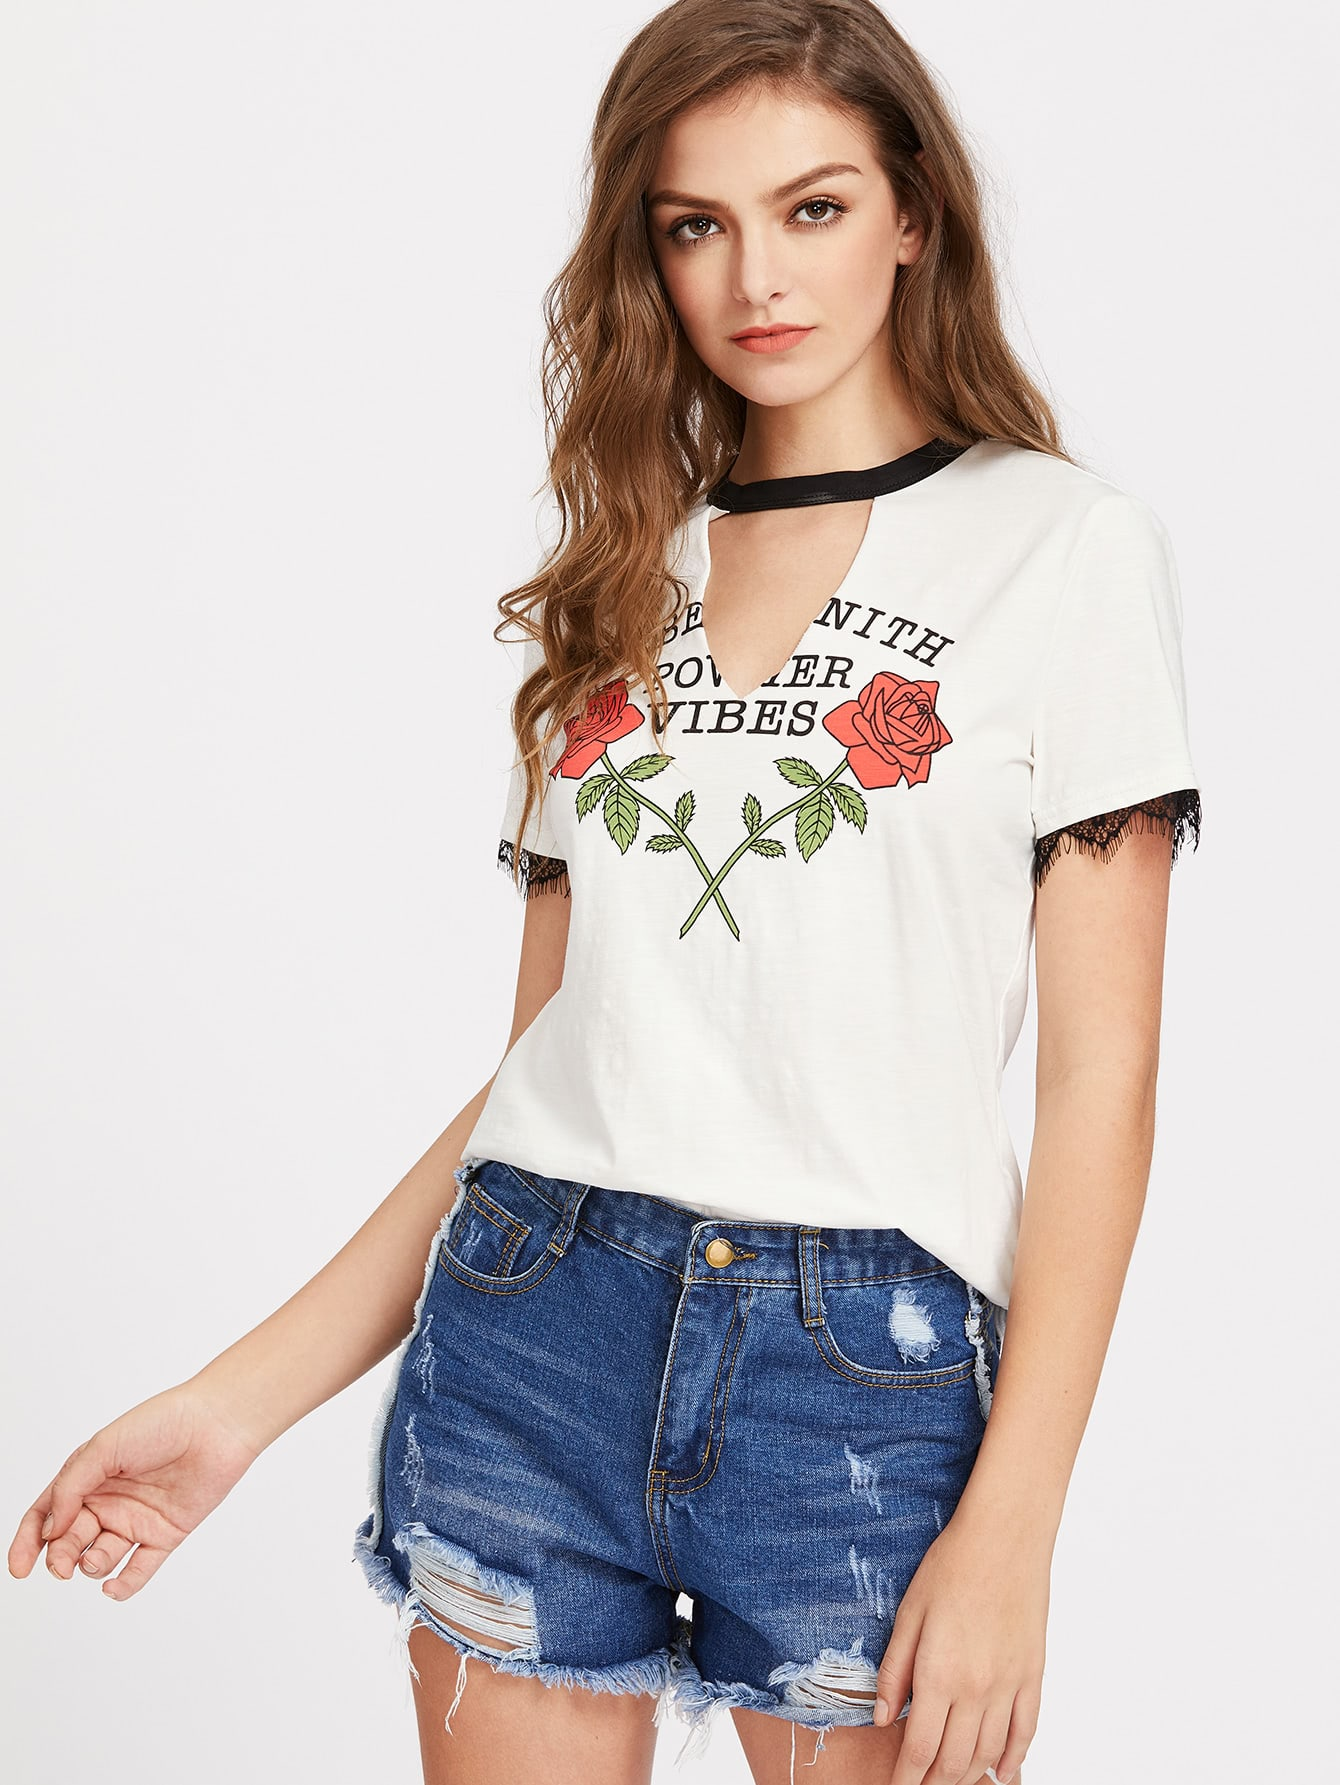 Basic T Shirts Women S